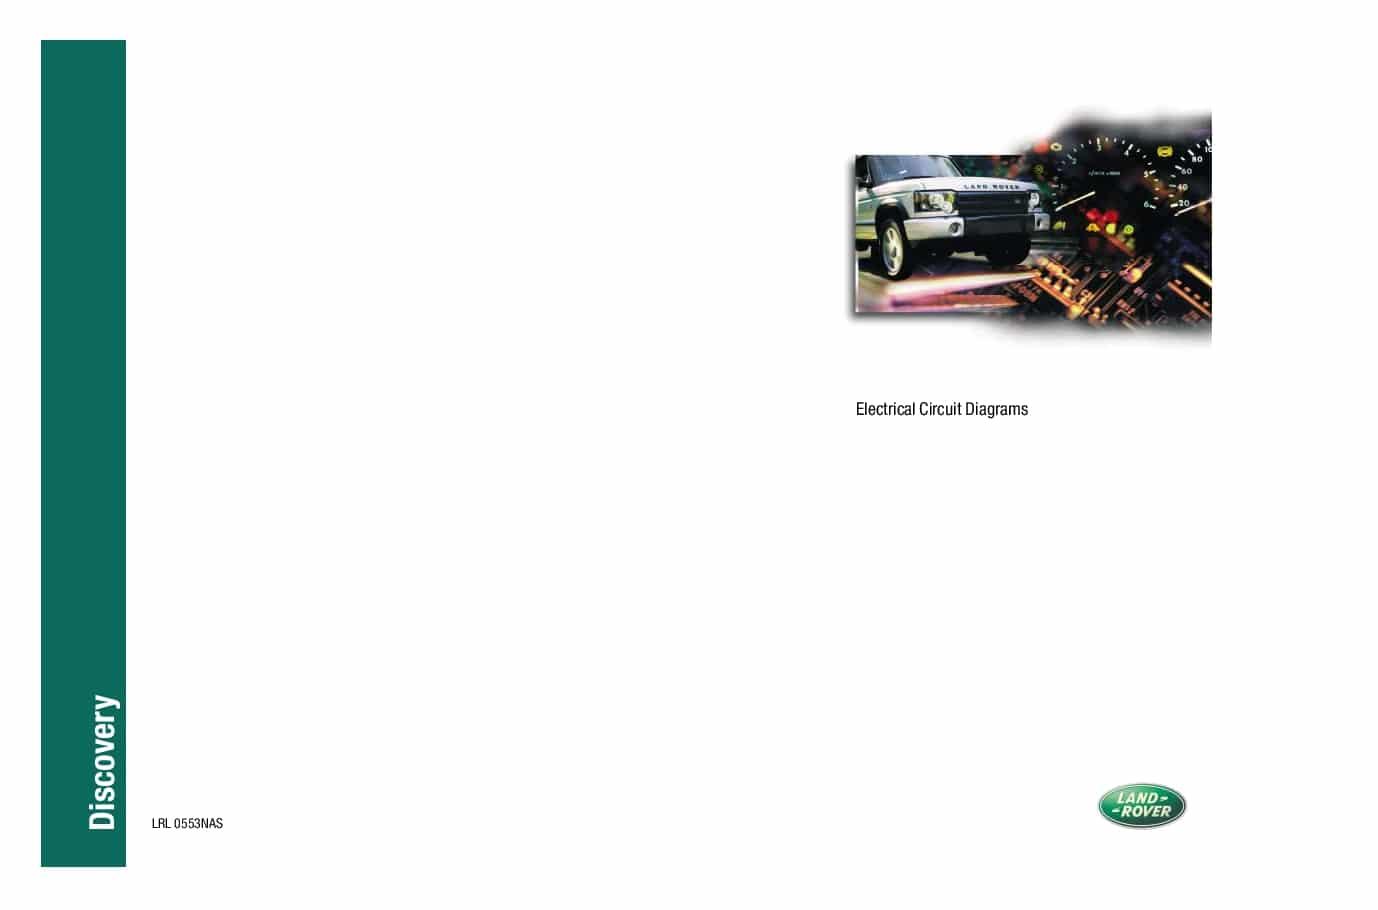 neptune 3 rover service manual